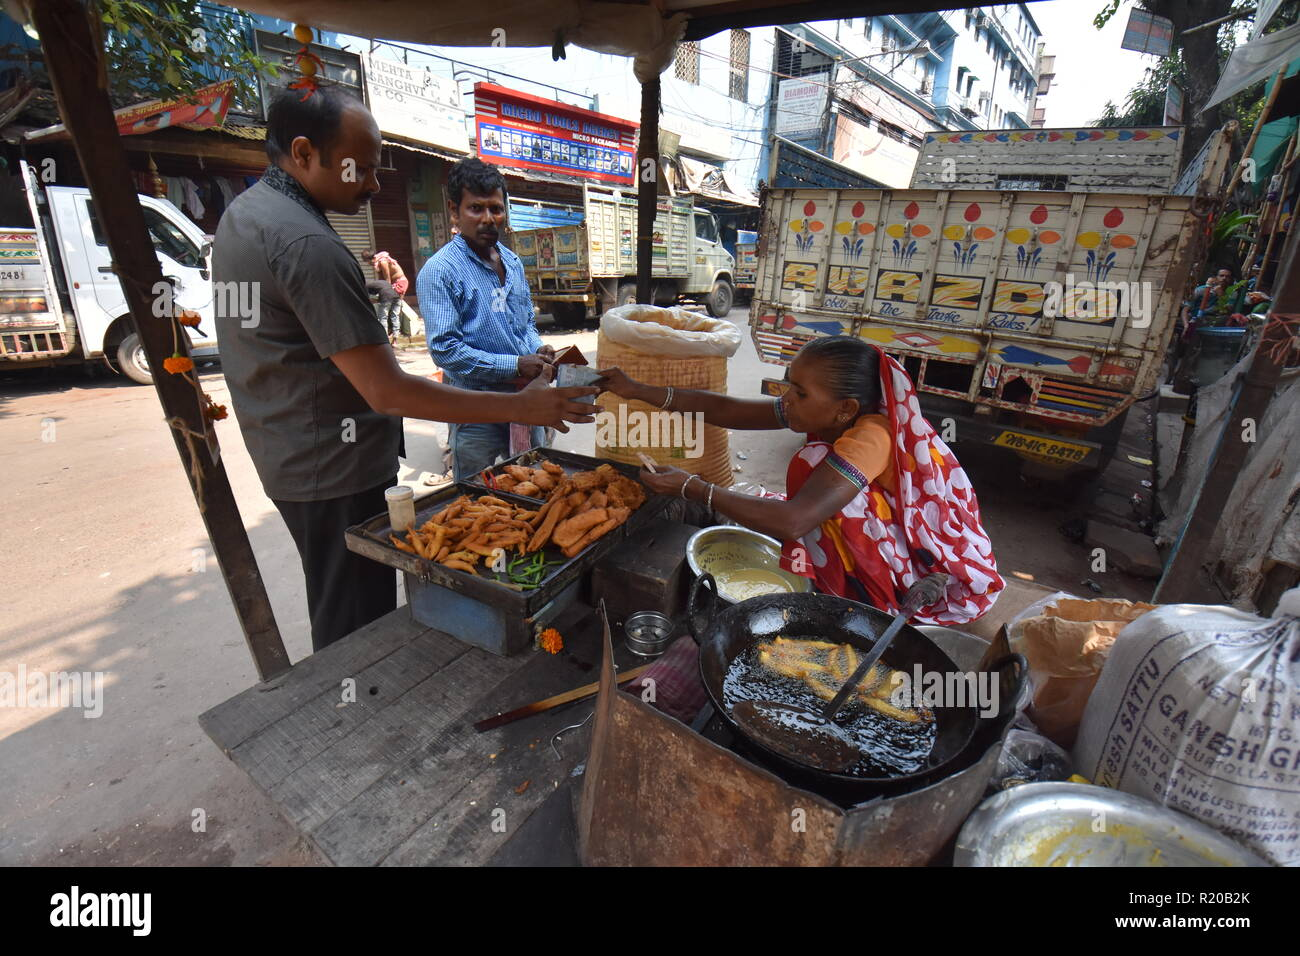 Fritter stall, Canning street, Kolkata, India - Stock Image